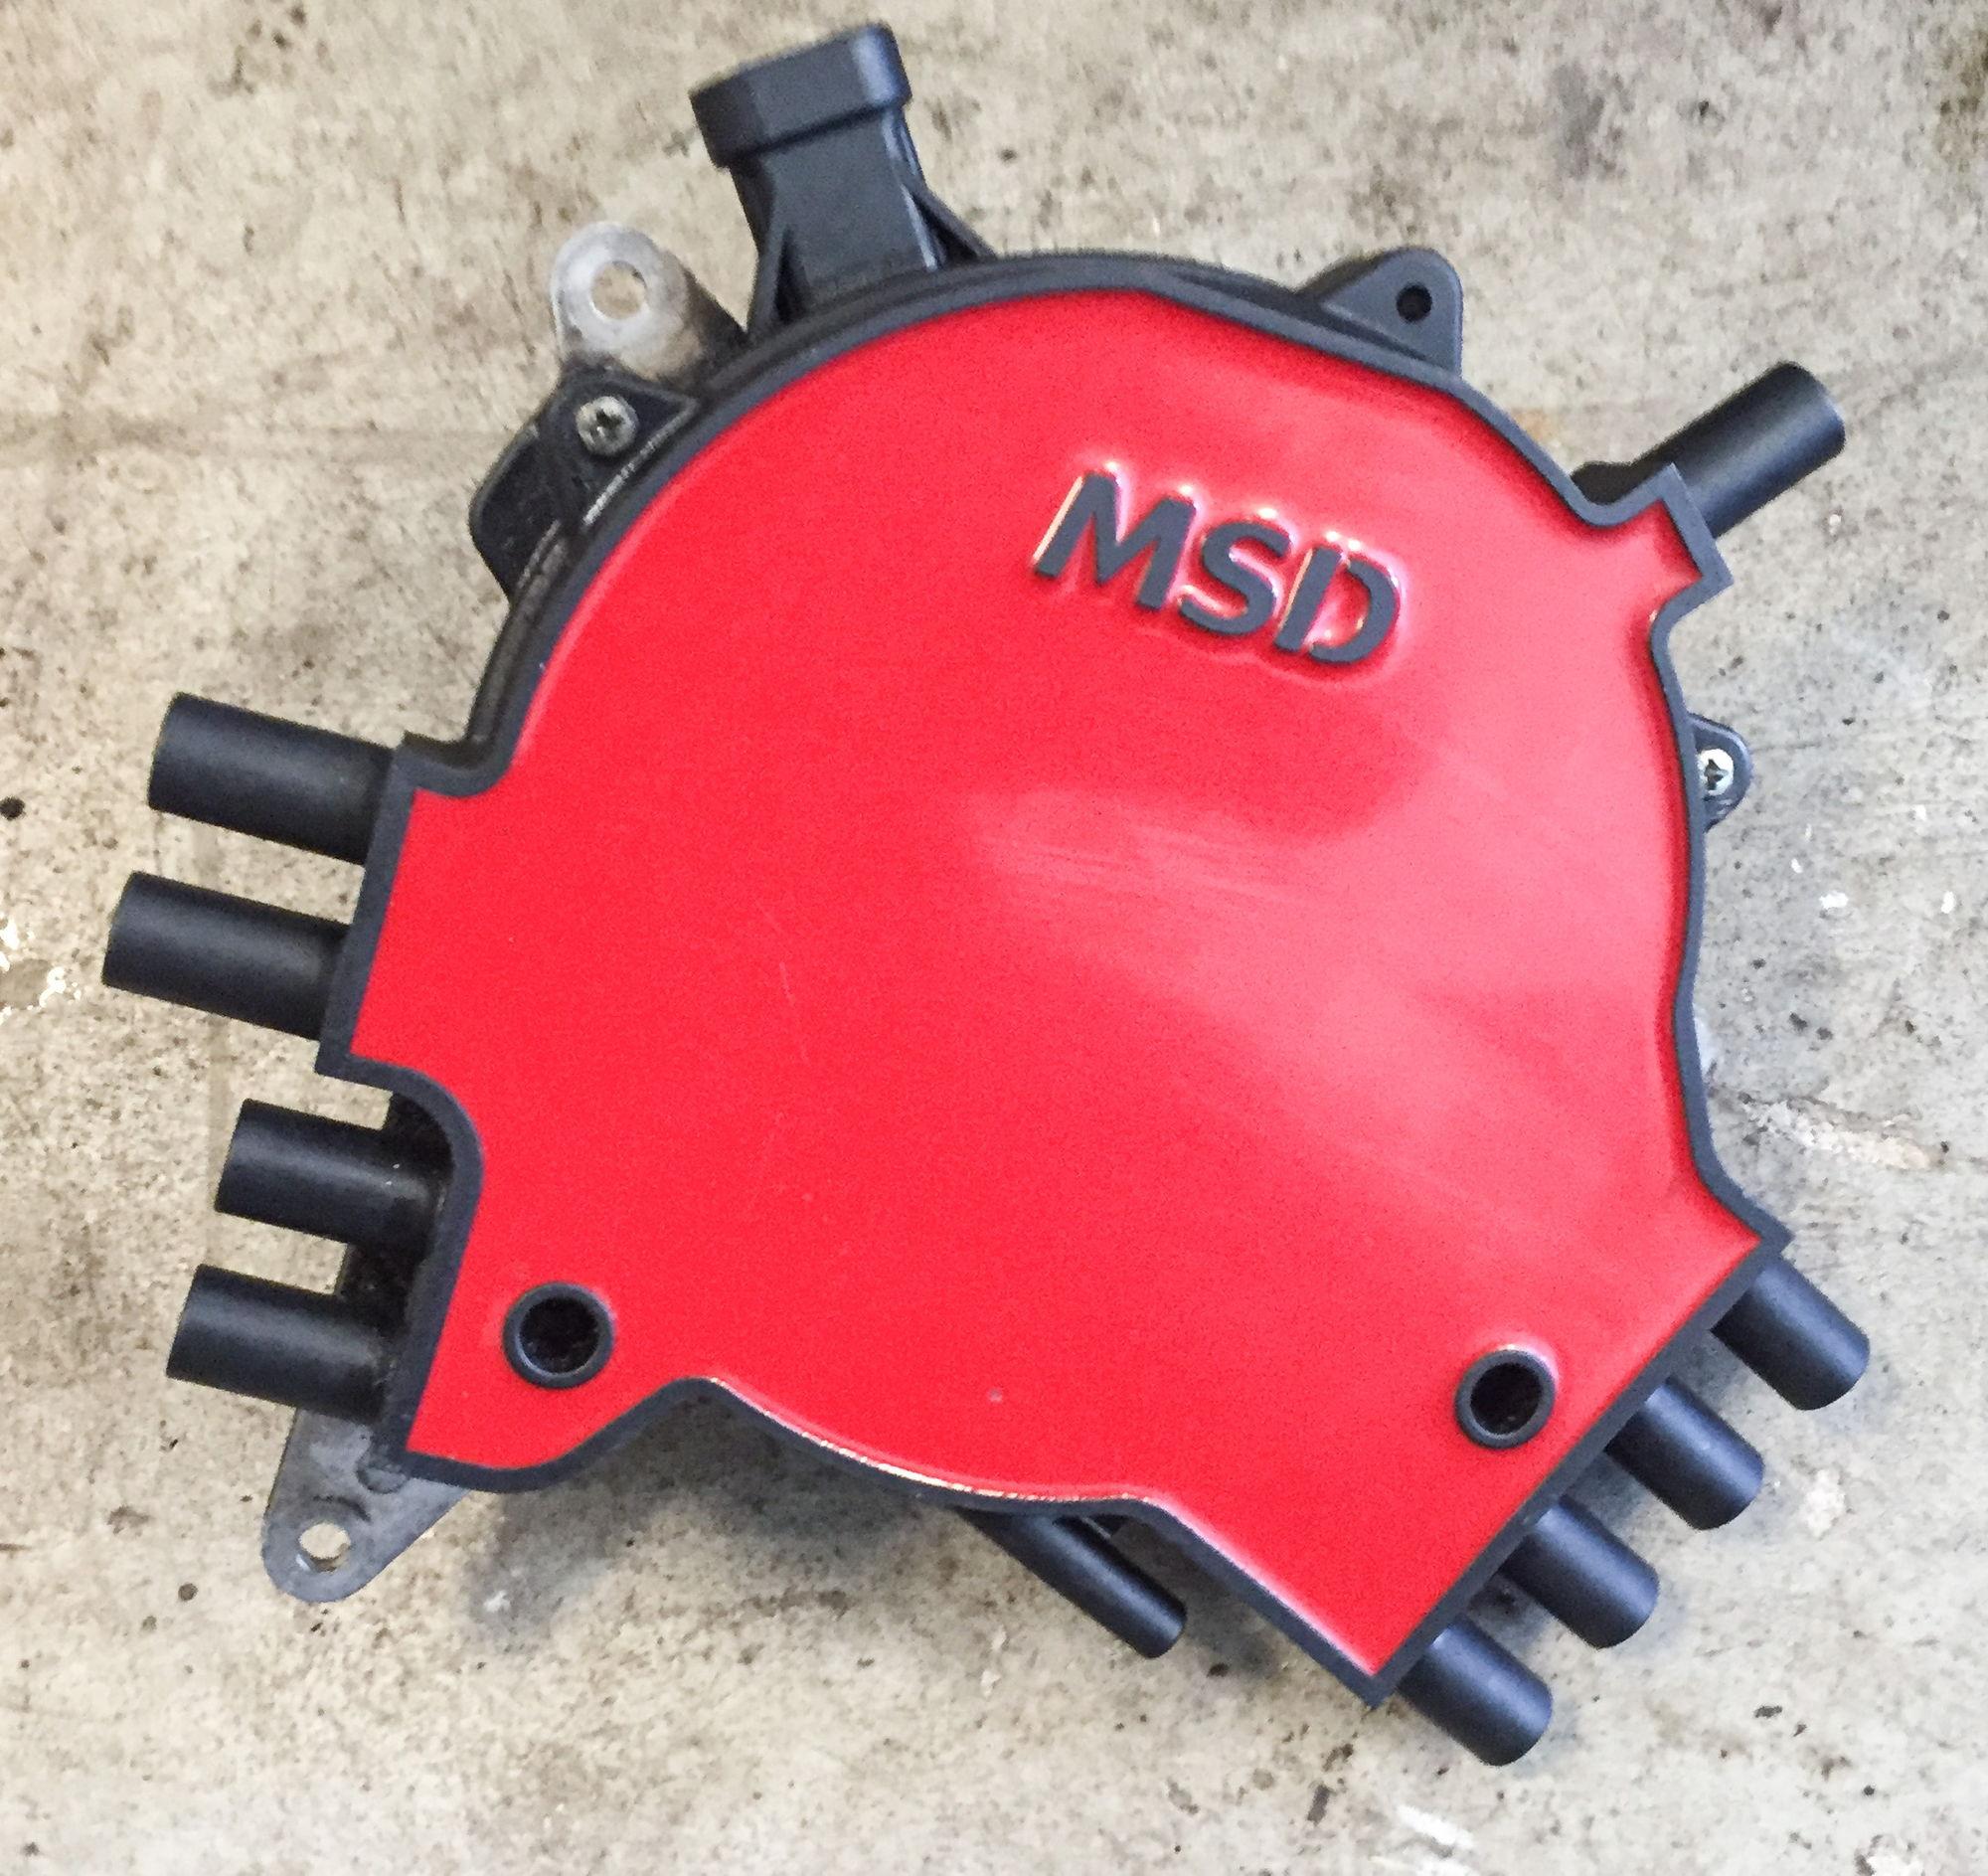 Lt1 Gm Optispark Gear Drive: '95-'97 GM Optispark With MSD Cap And Rotor